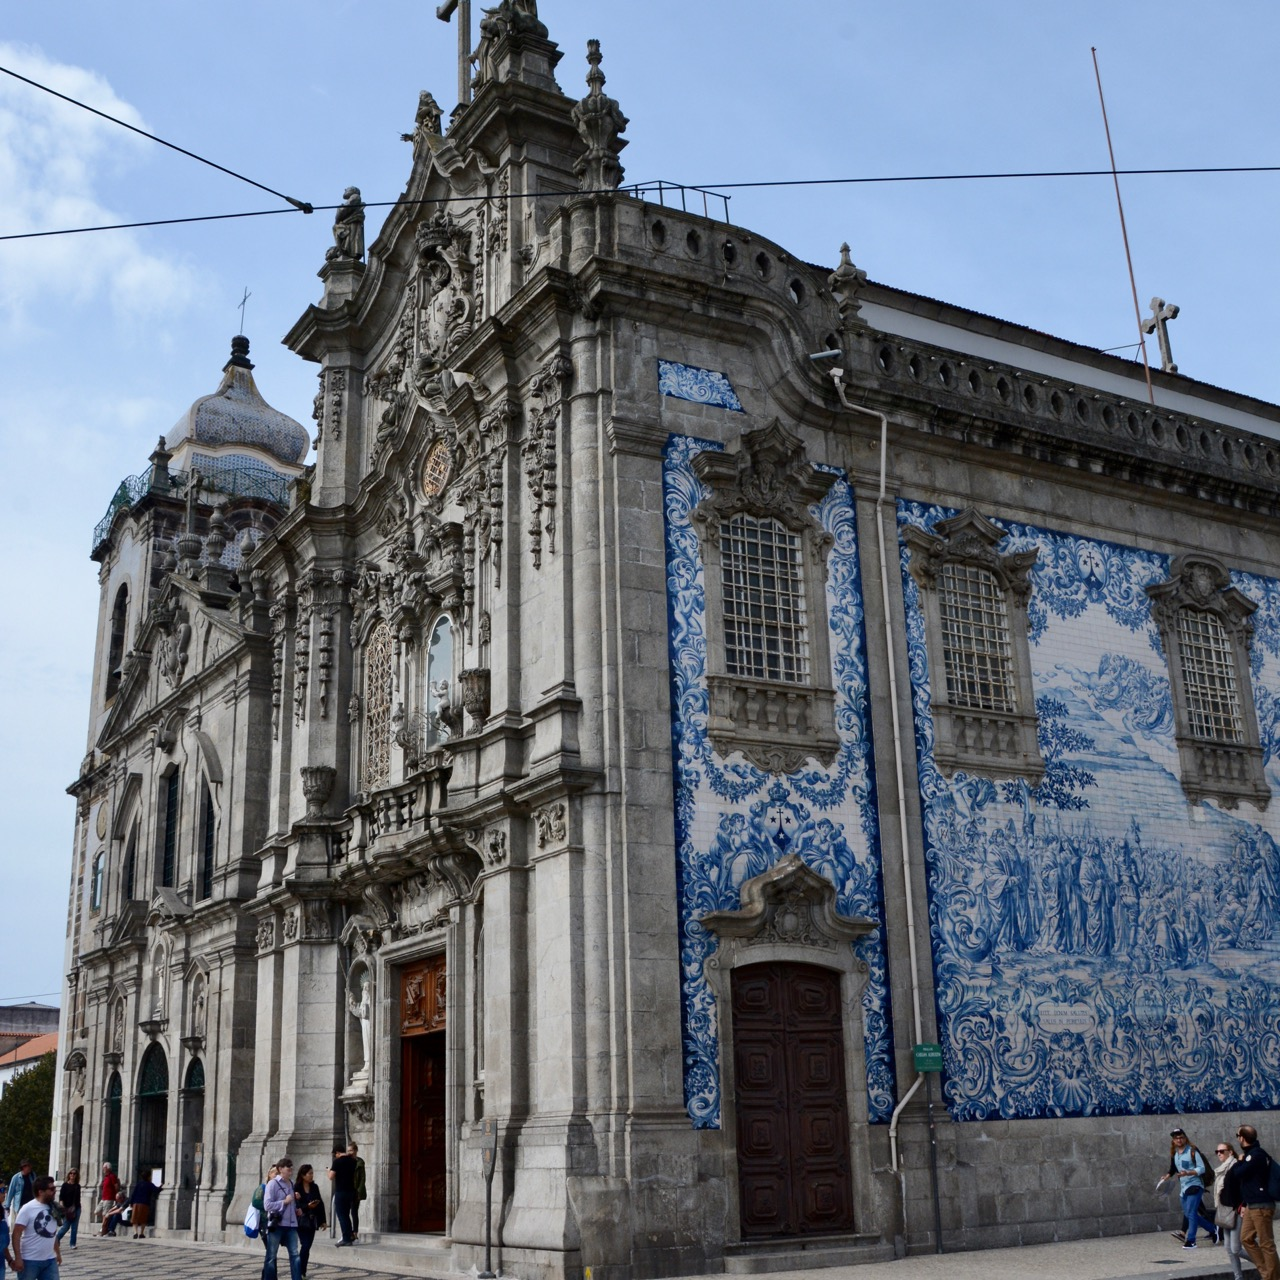 travel with kids children porto portugal chuch cloister